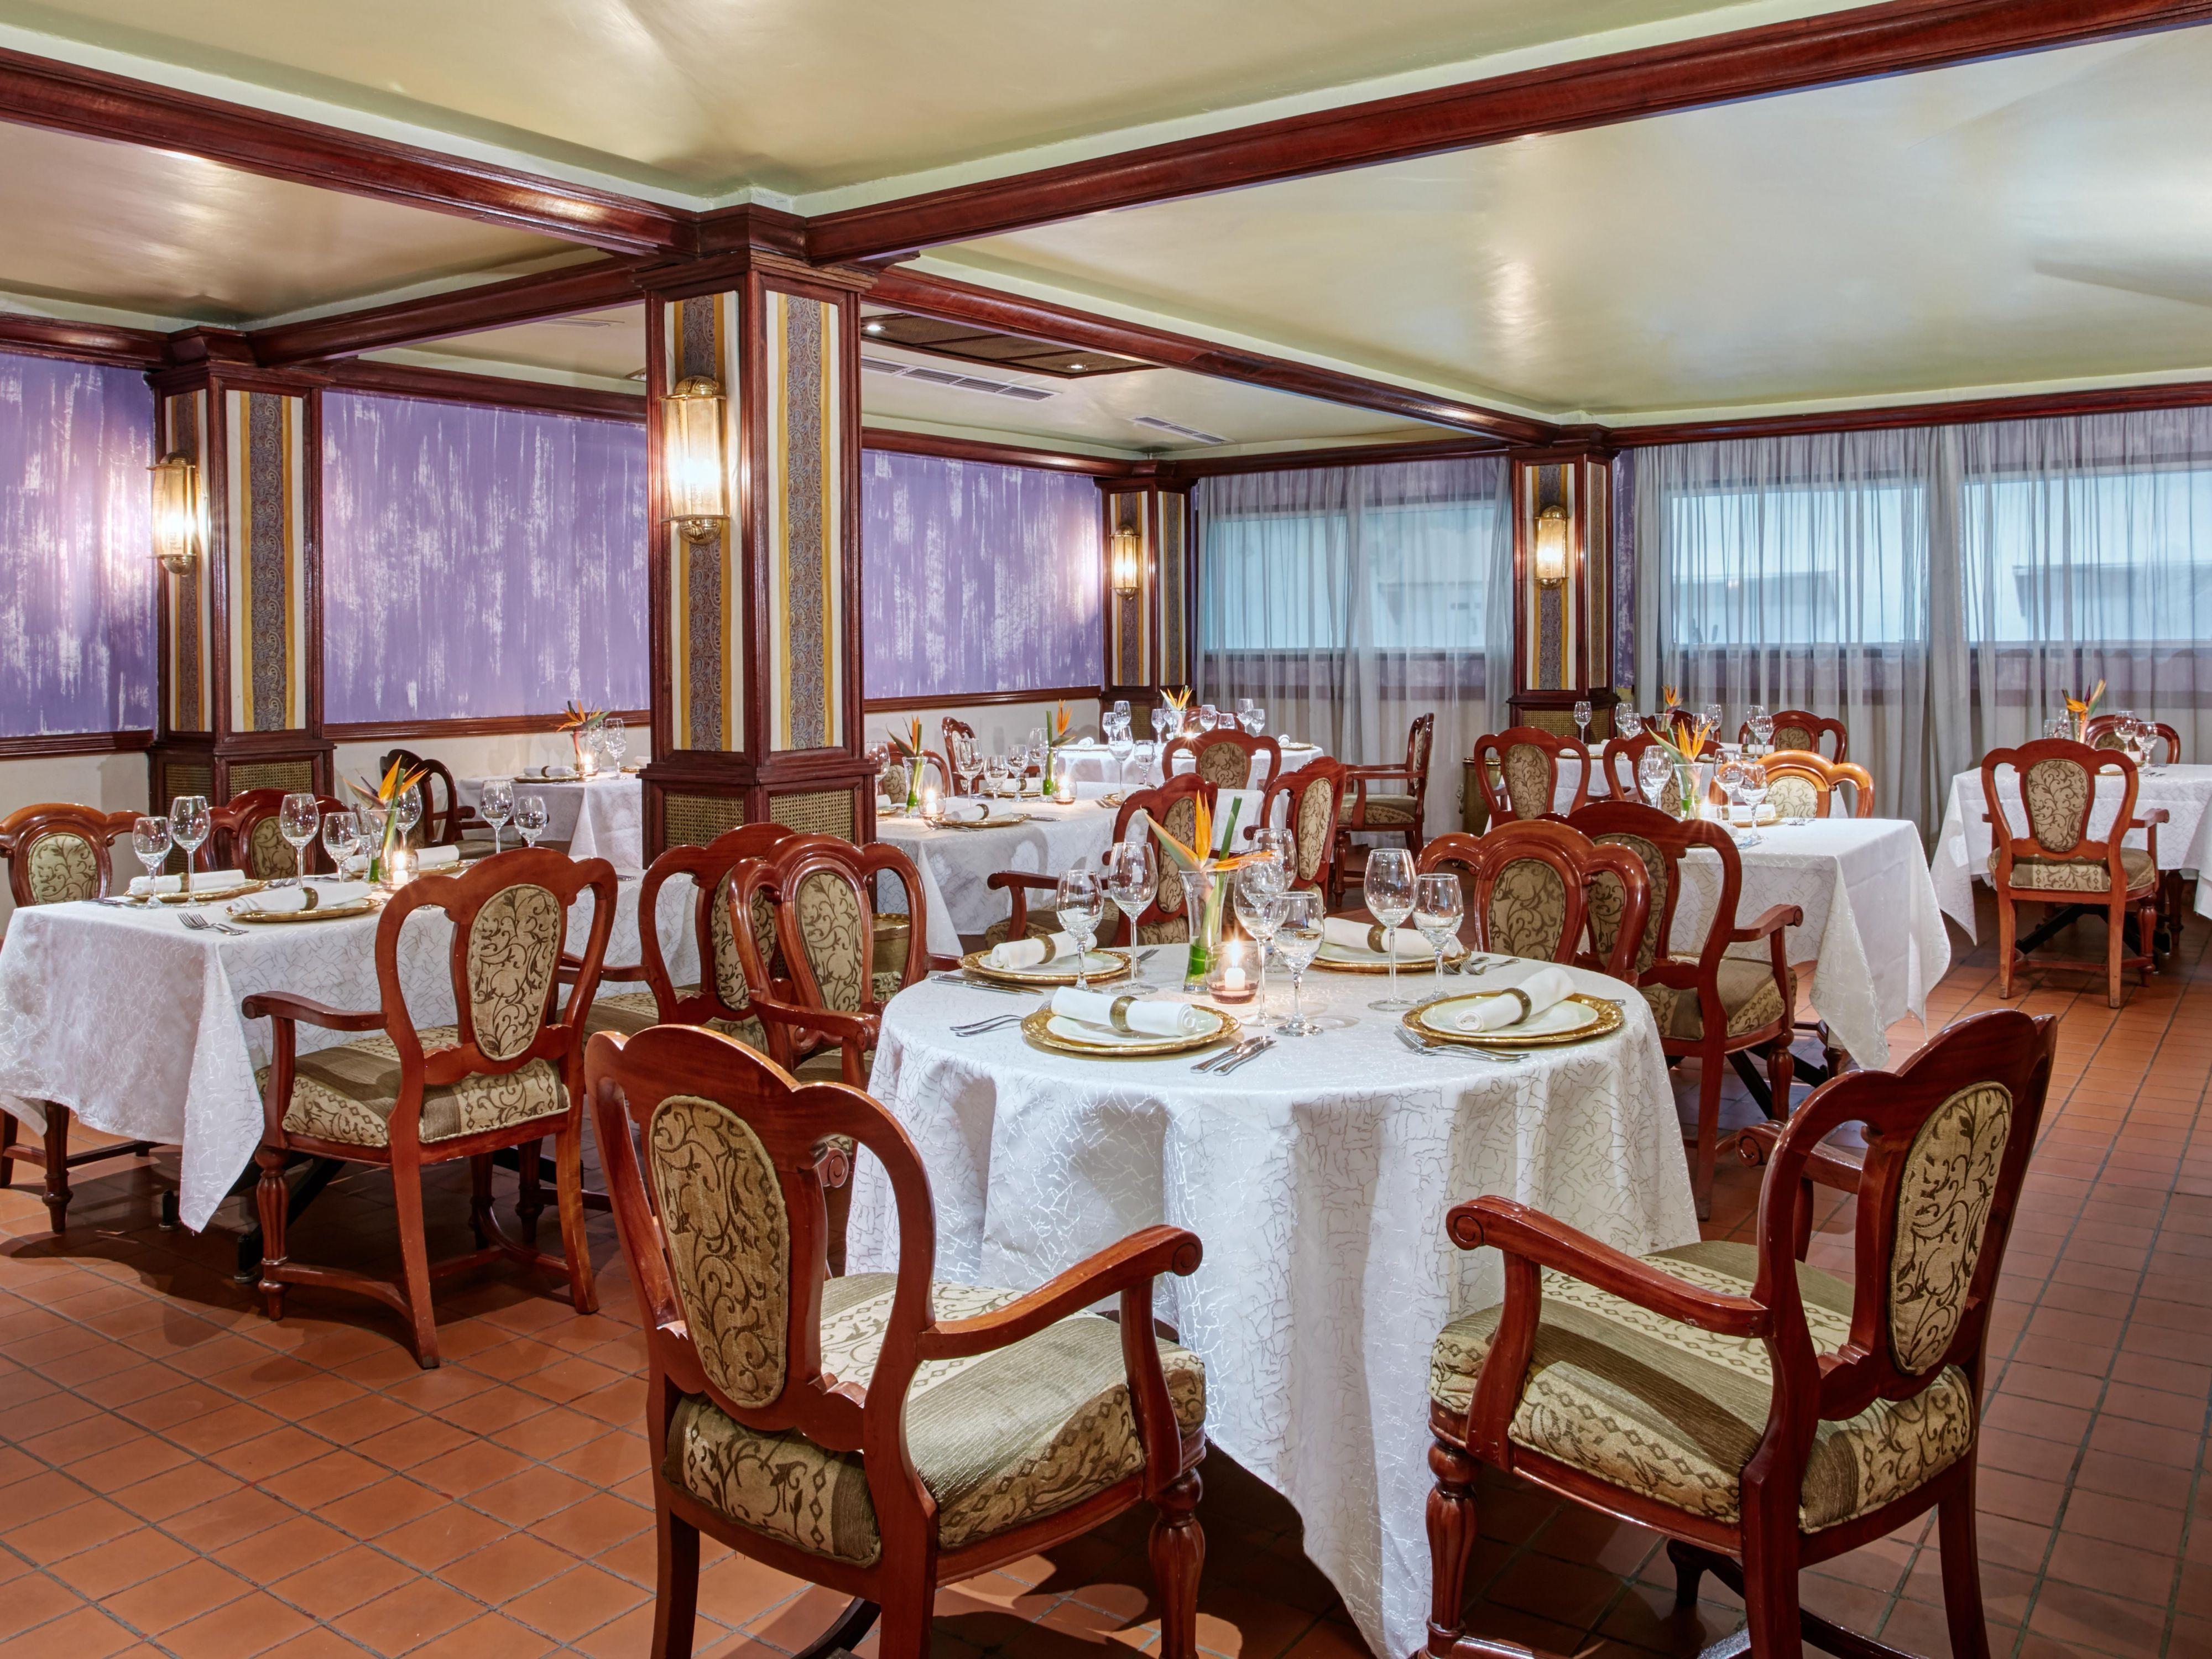 Nairobi Hotels: InterContinental Nairobi Hotel in Nairobi, Kenya